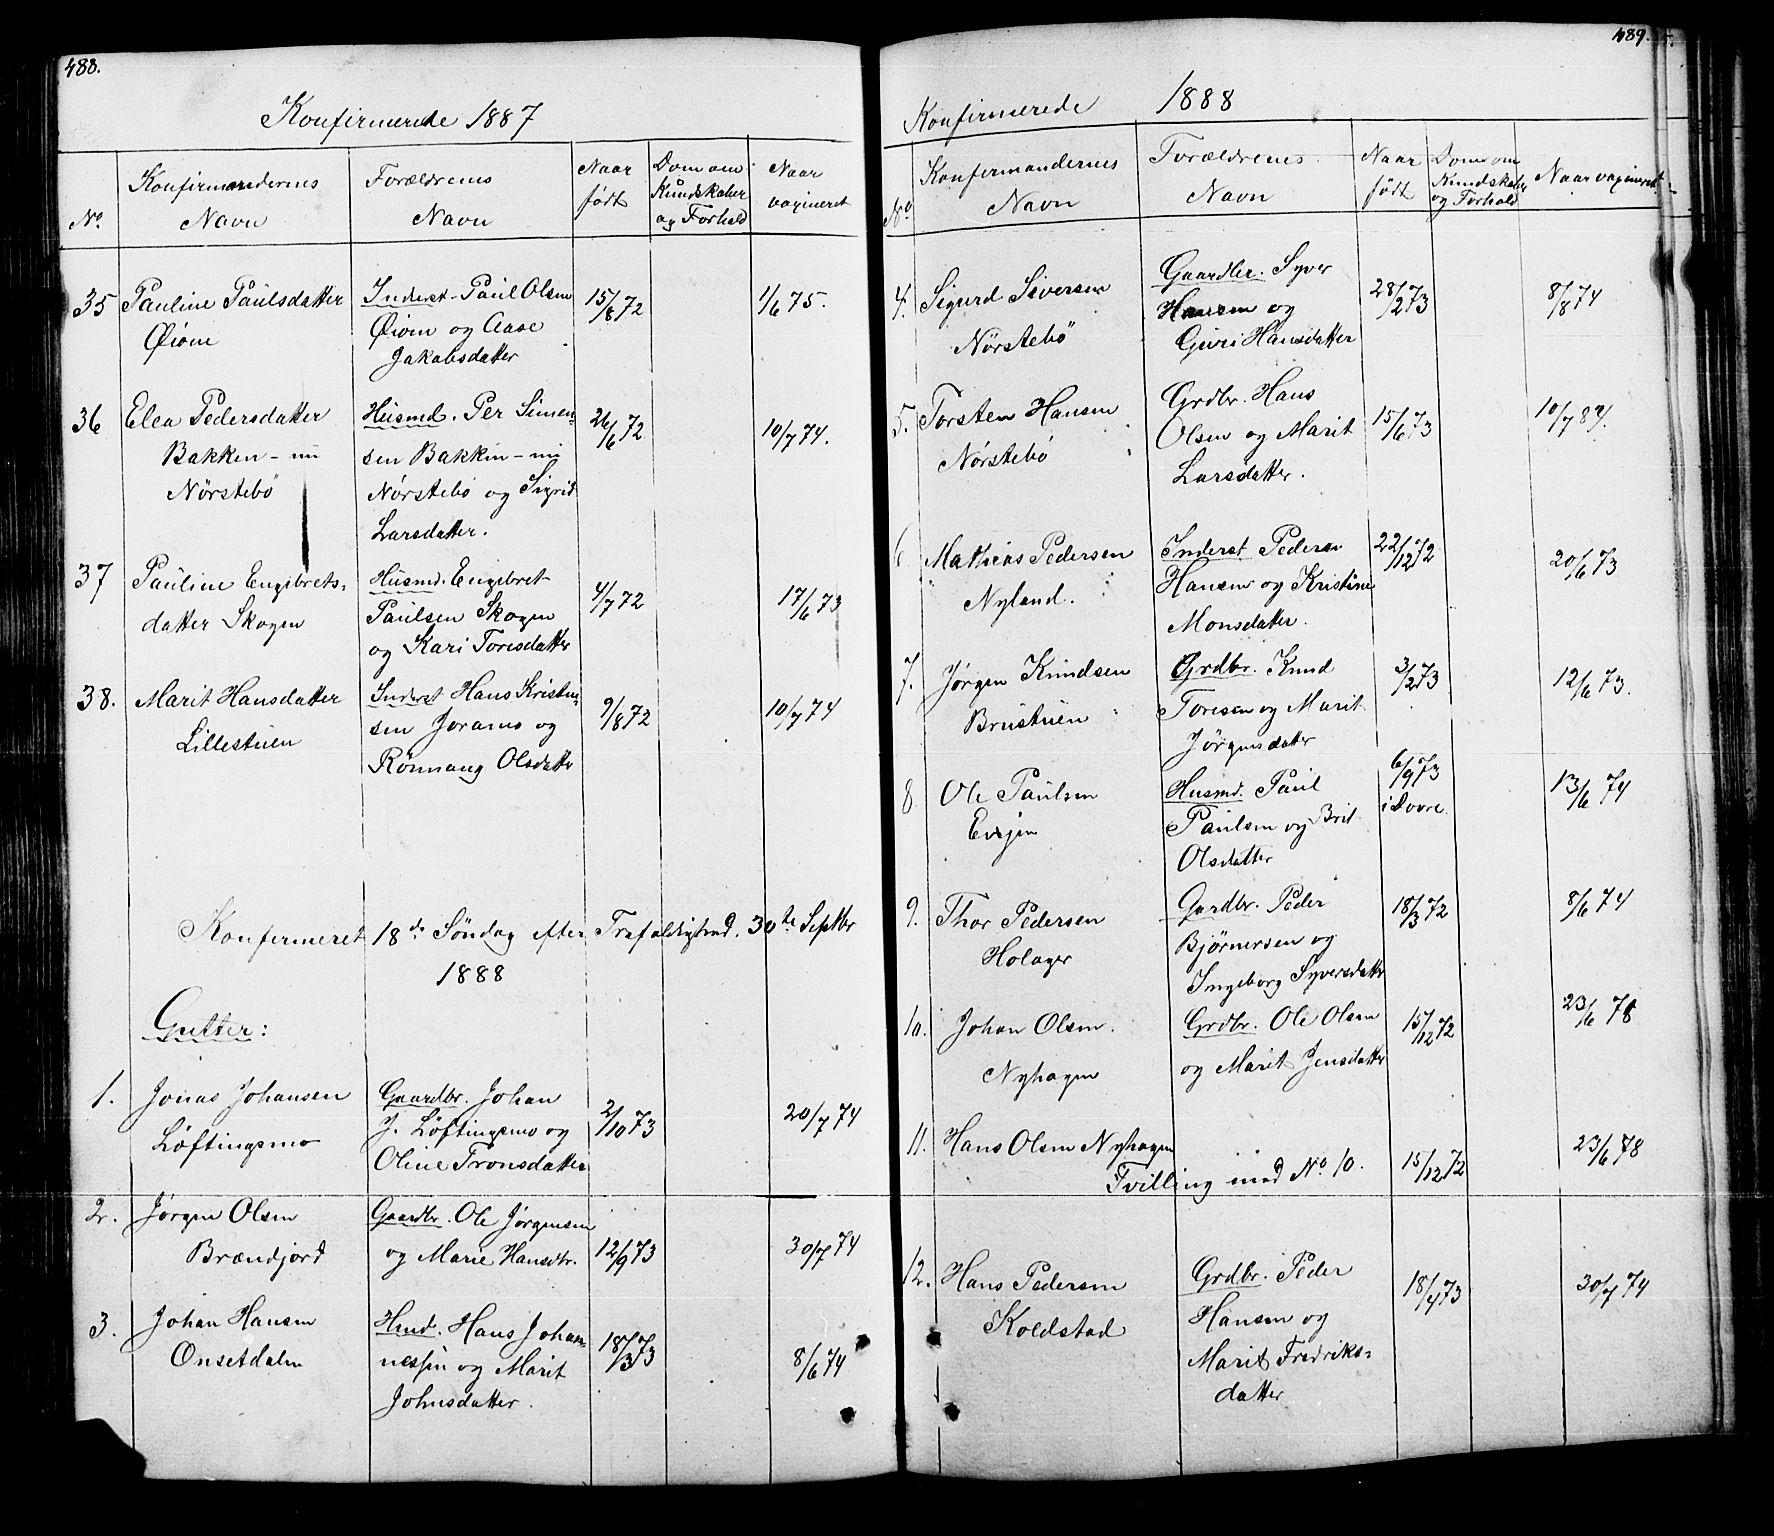 SAH, Lesja prestekontor, Klokkerbok nr. 5, 1850-1894, s. 488-489